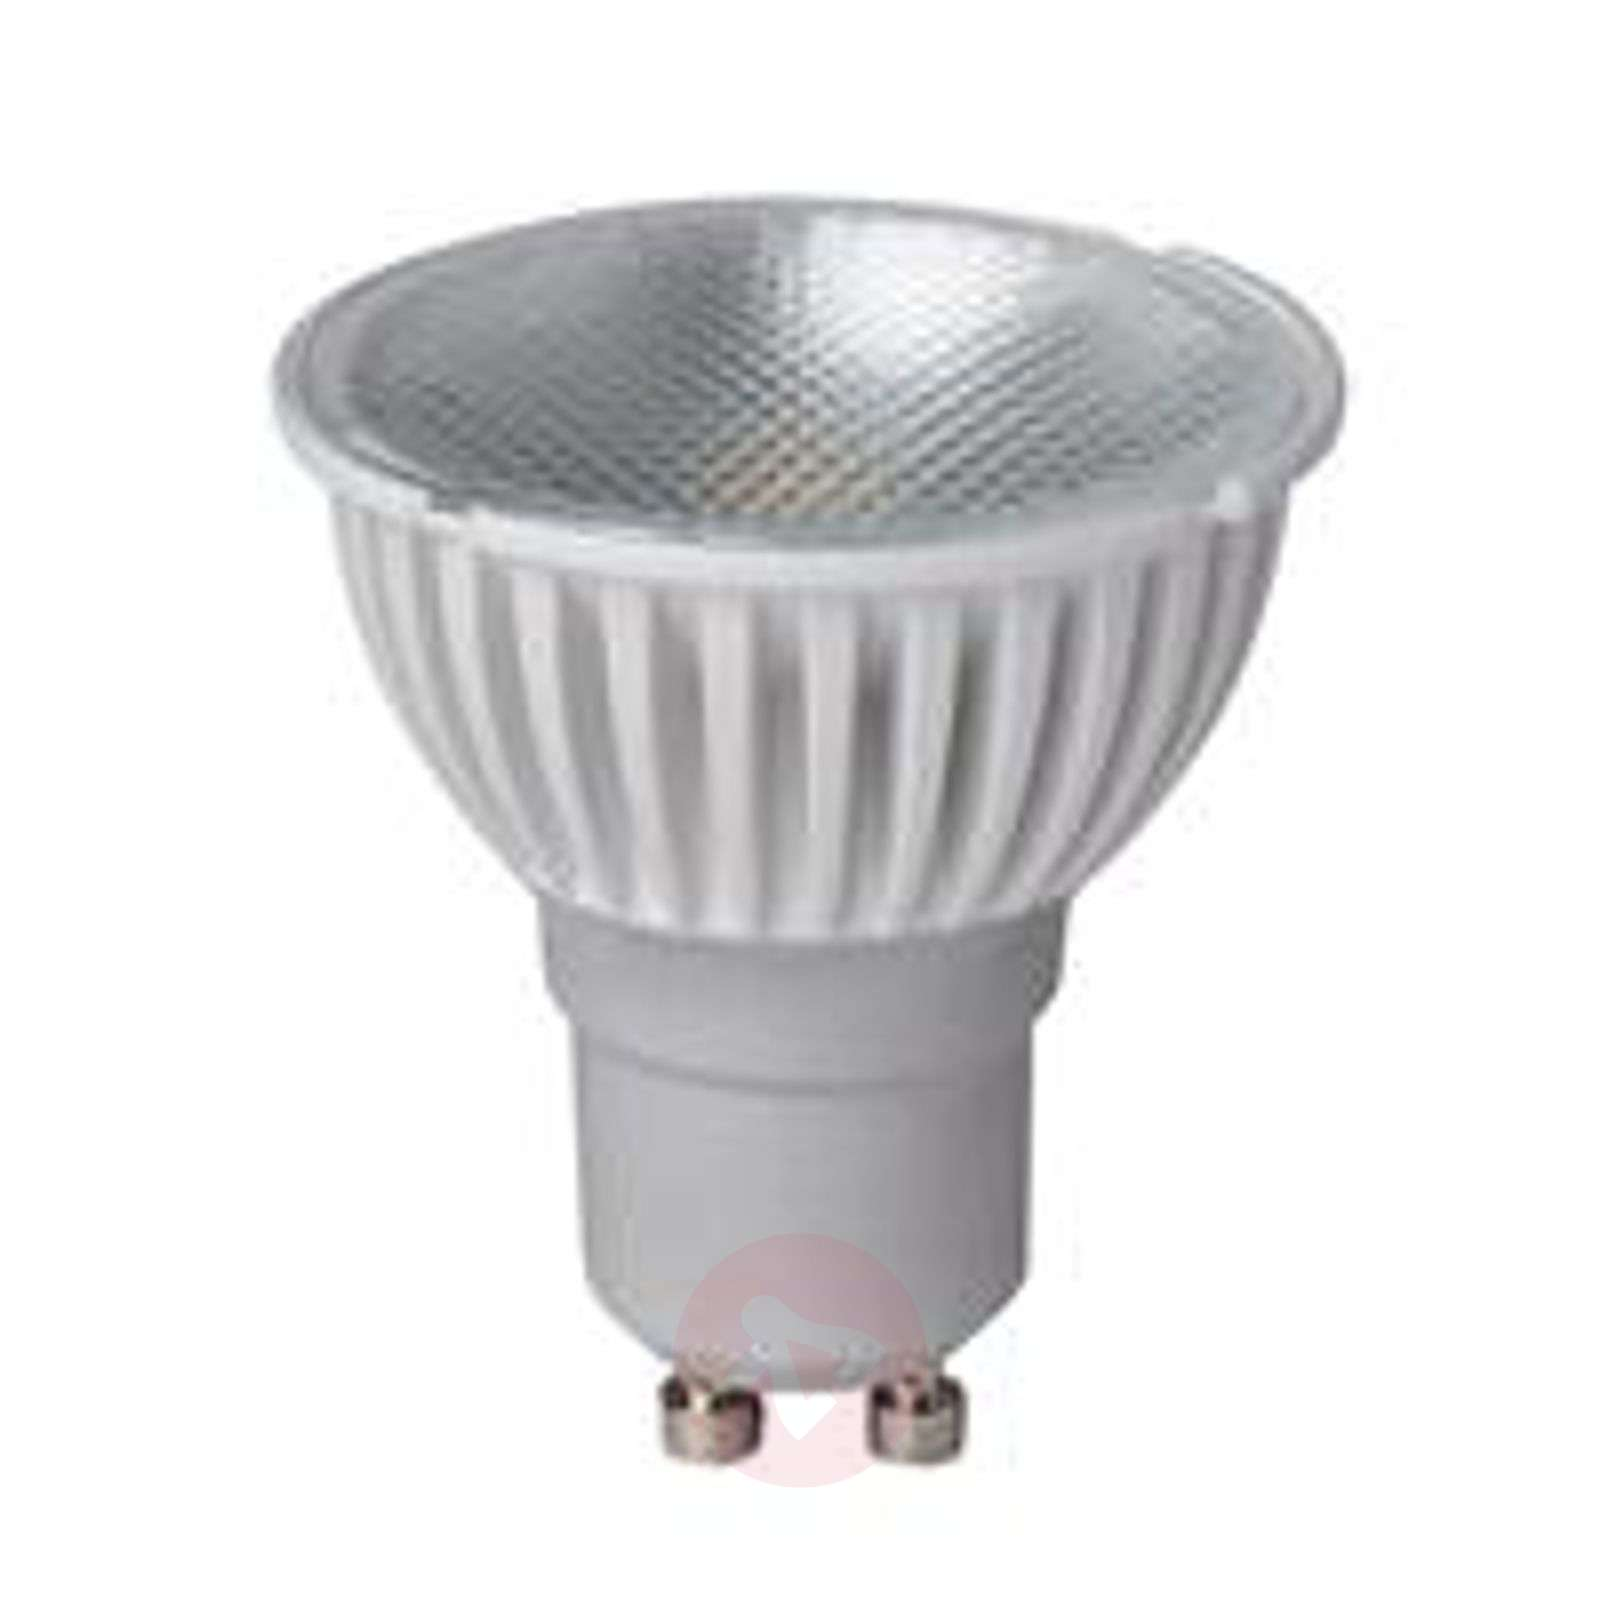 GU10 5,5W PAR16 828 LED-heijastinlamppu 35degree-6530221-01